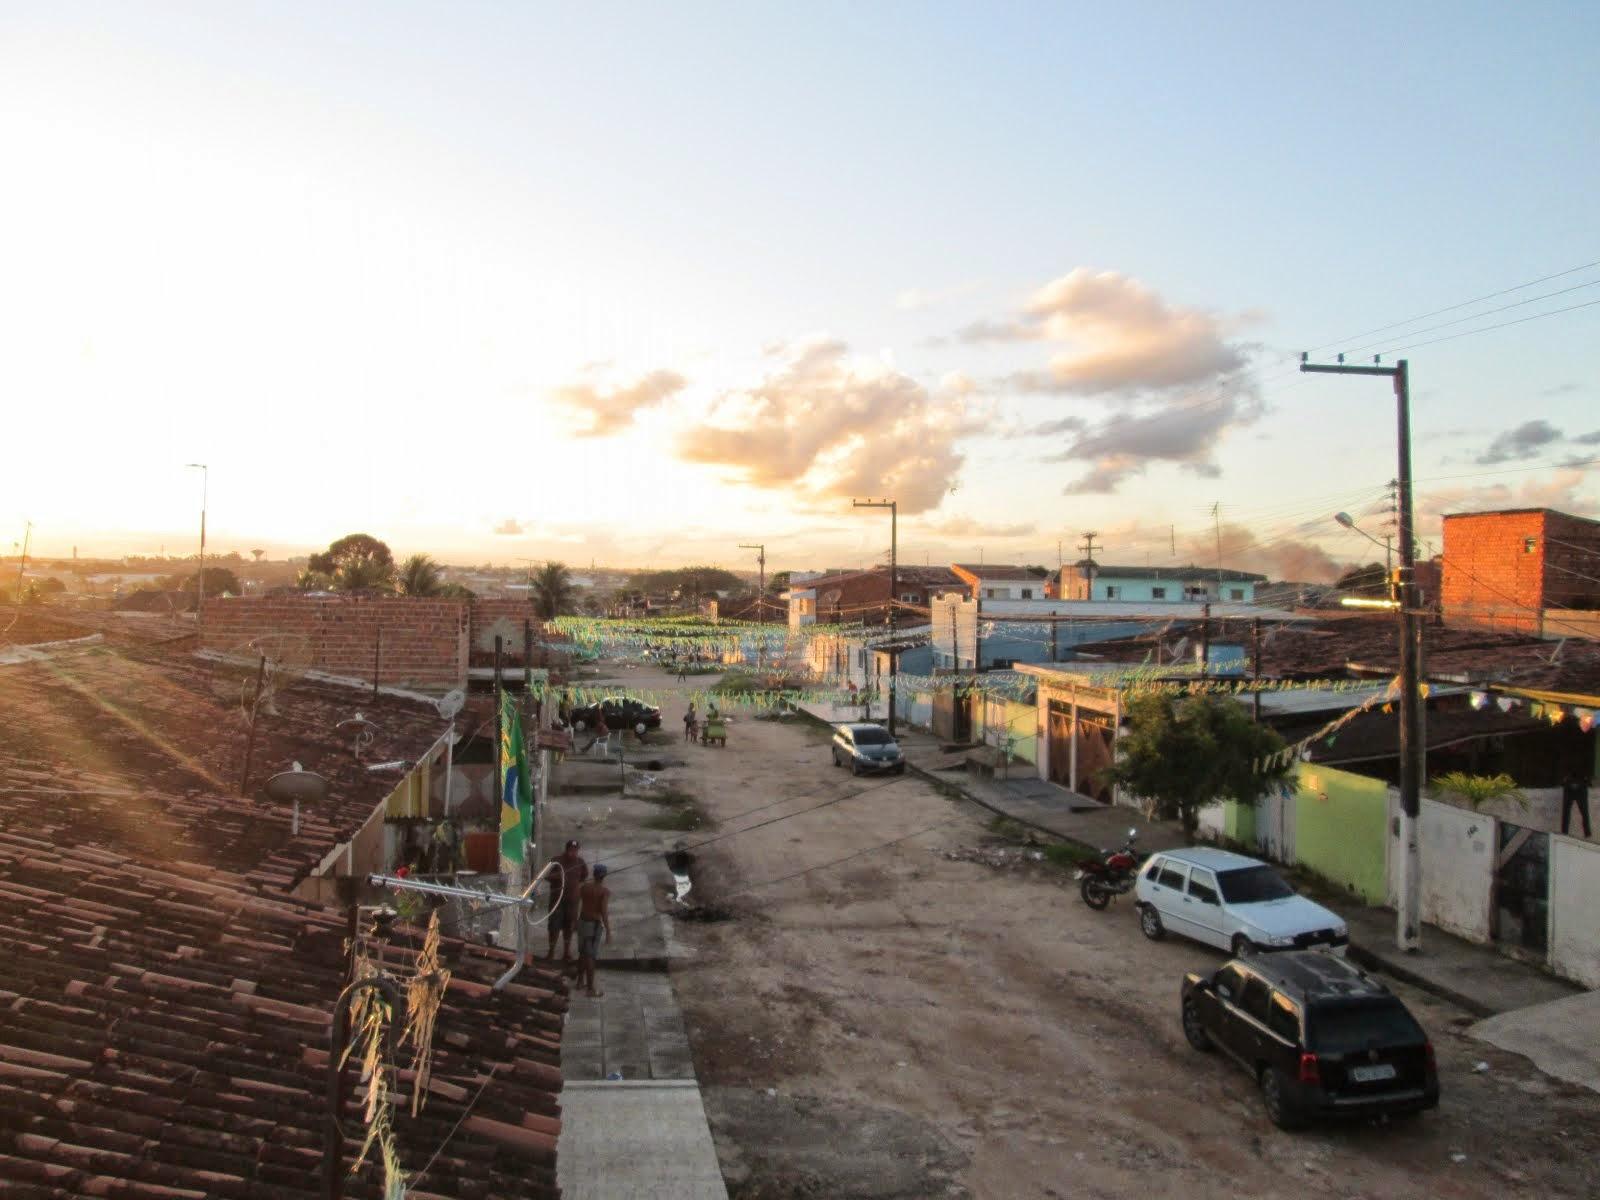 5th Area Tabuleiro Maceió Alagoas 6/25/14